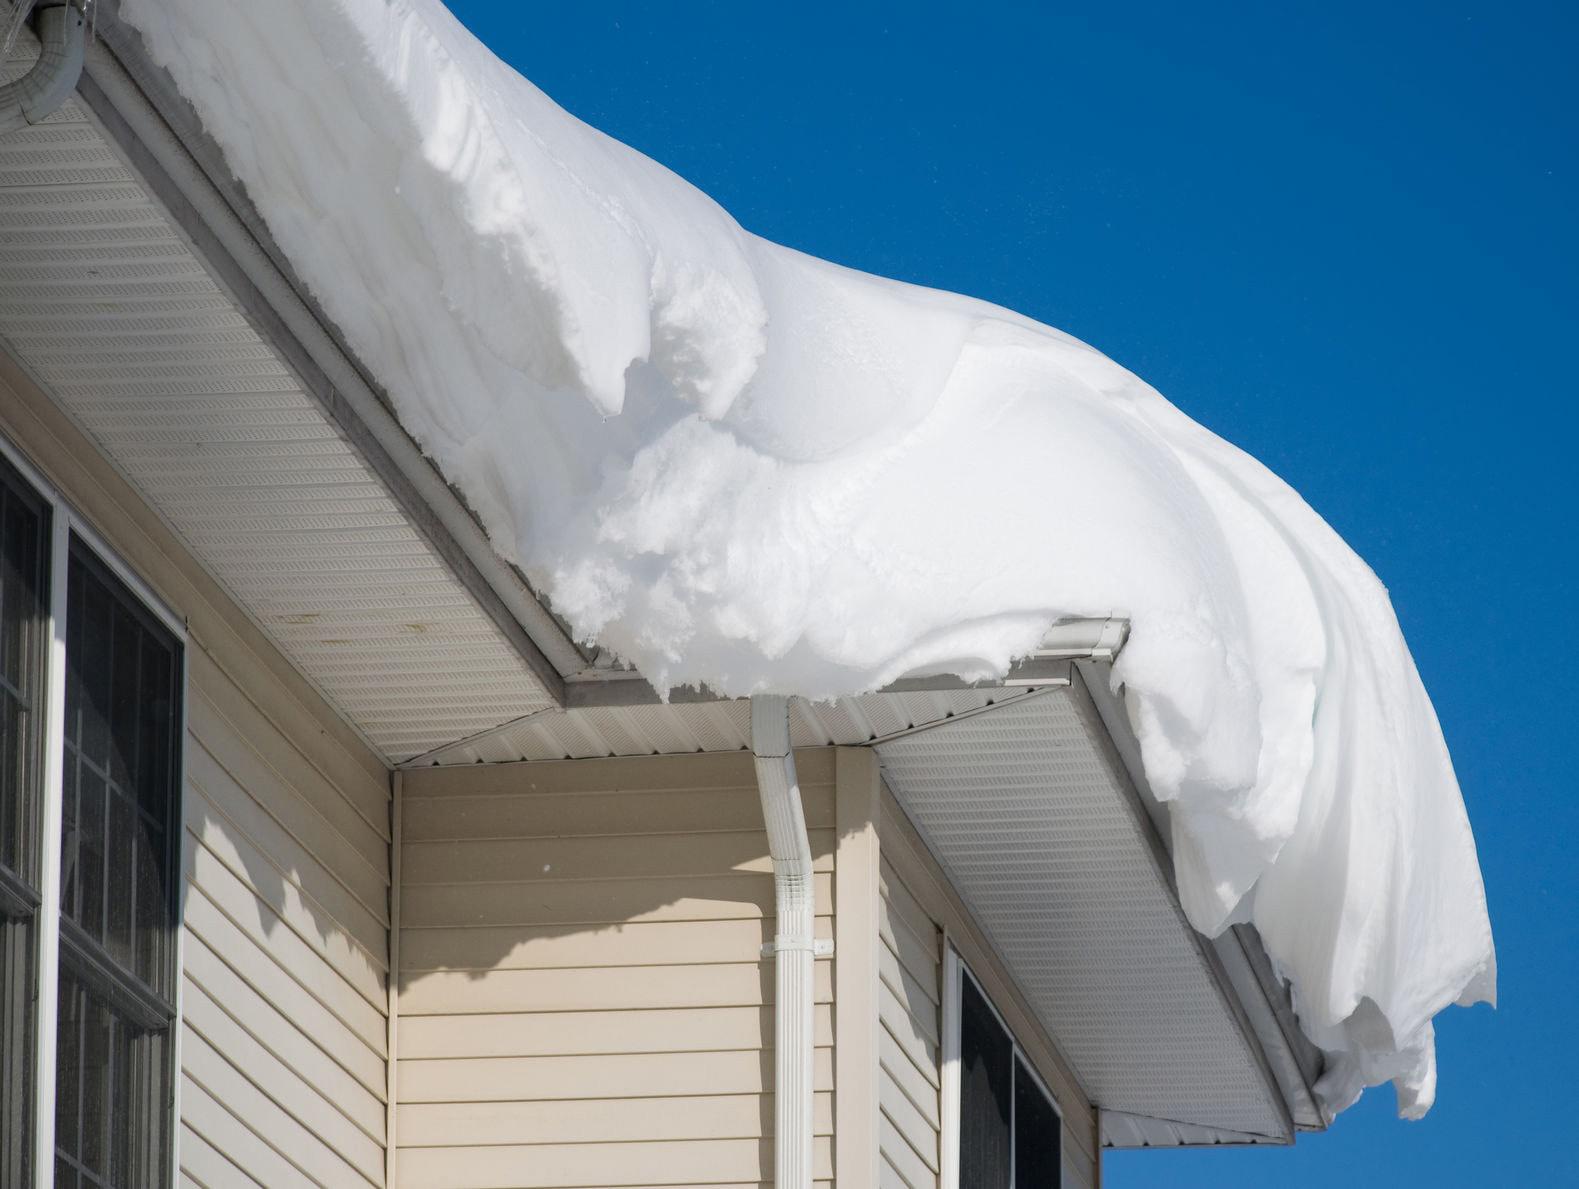 Prevent snow damage